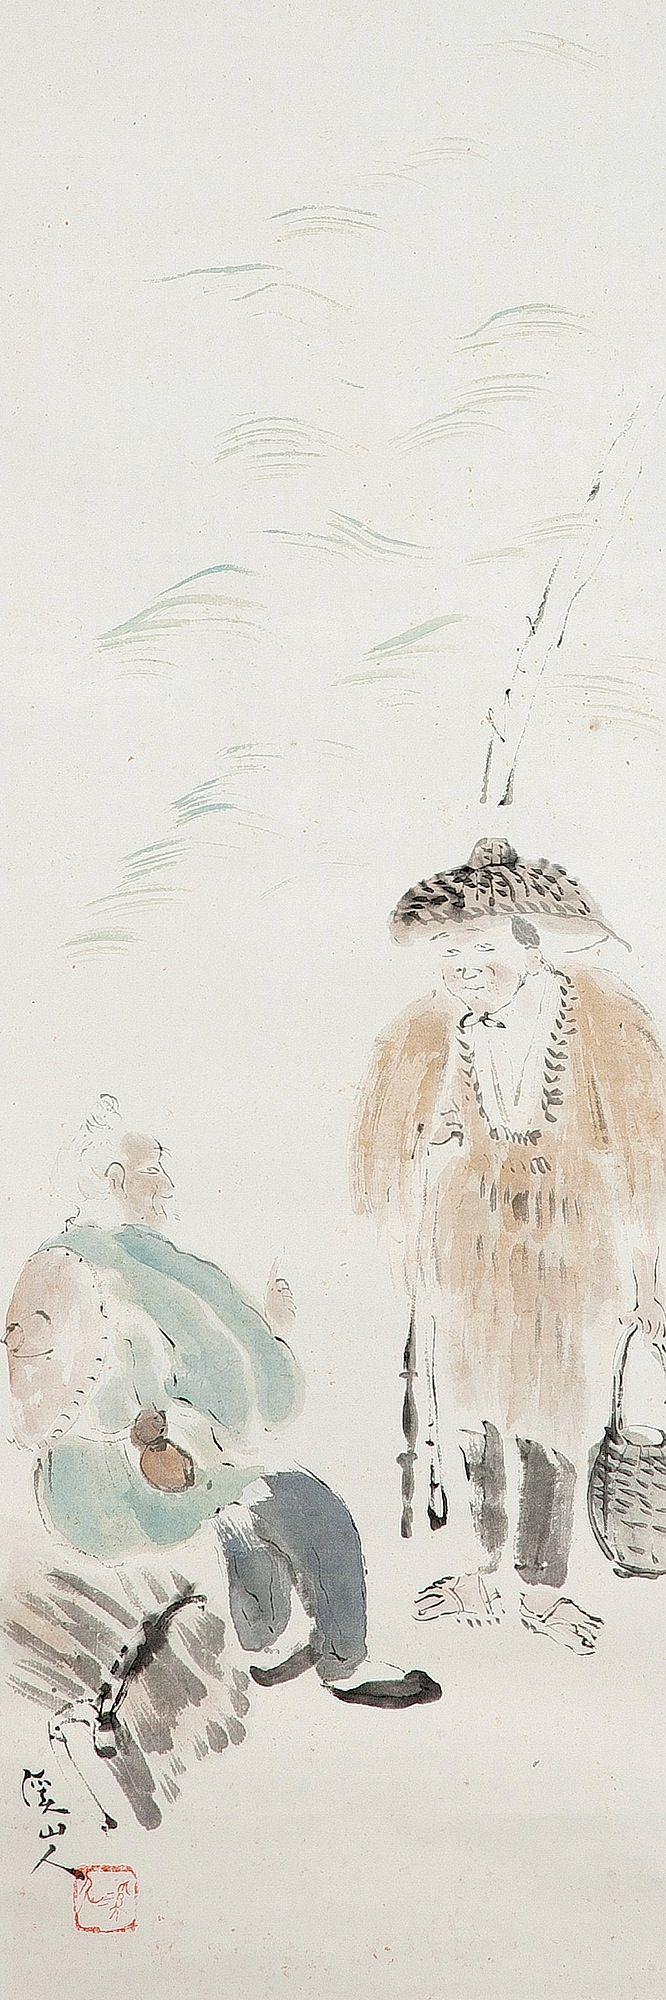 Tomita Keisen 富田渓仙 (1879-1936), 漁樵問答.